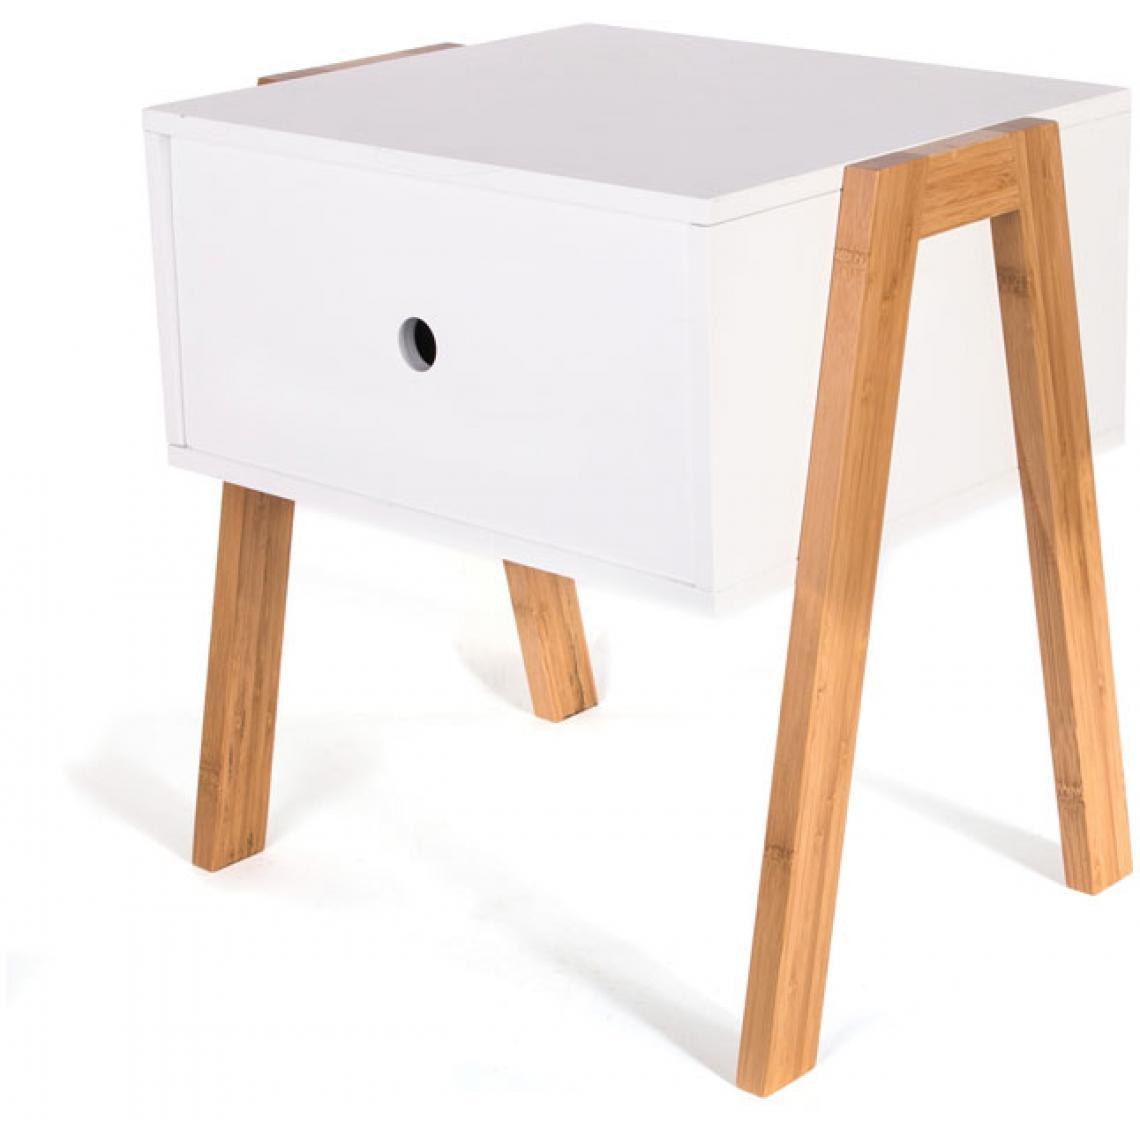 De Chevet Suisses Table Empilable Blanc Rolly3 NO8n0kXPw